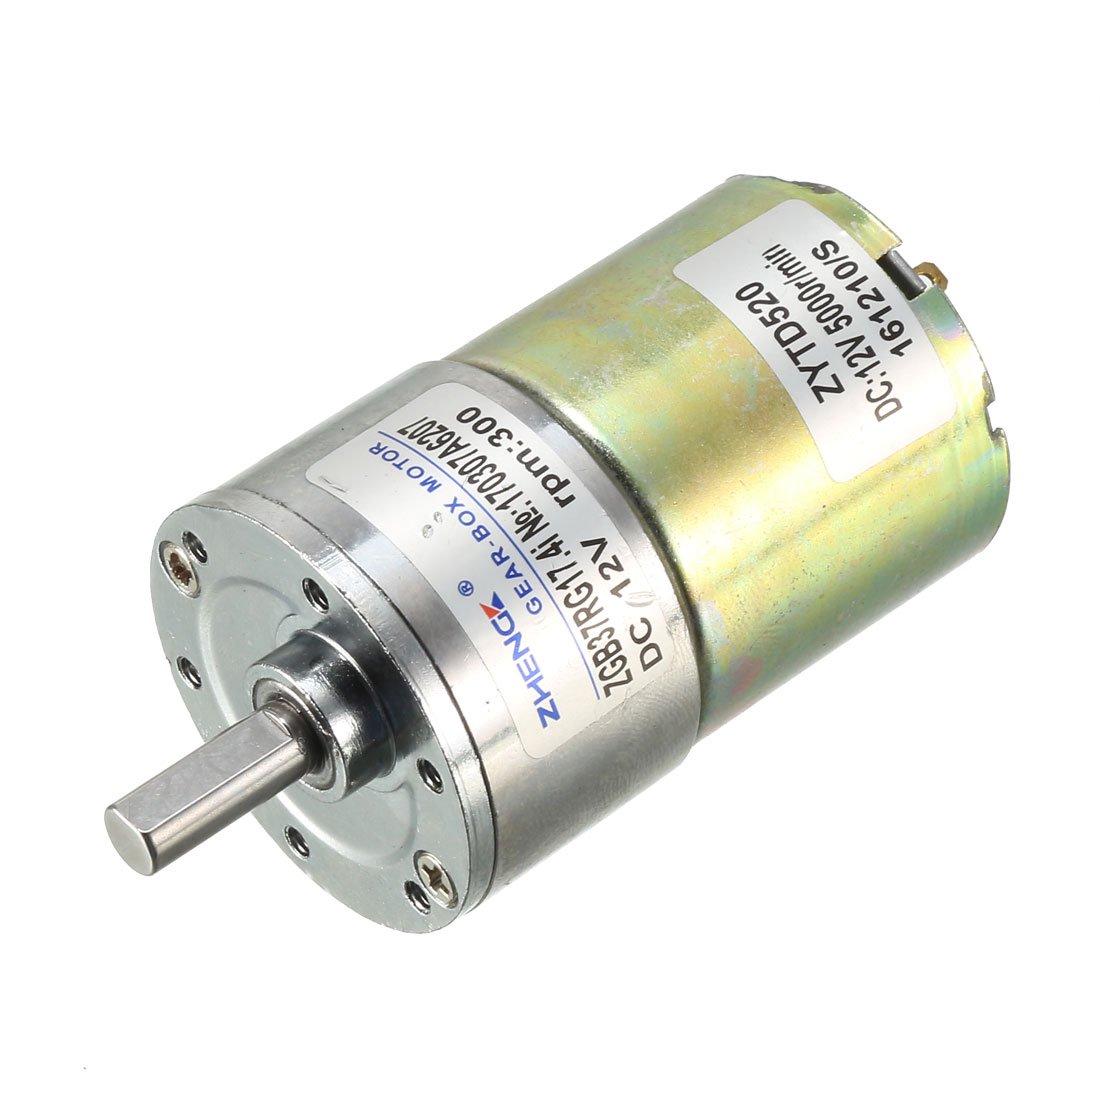 DC 12V 130mA 300RPM 0 3Kg-cm High Torque Permanent Magnetic DC Gear